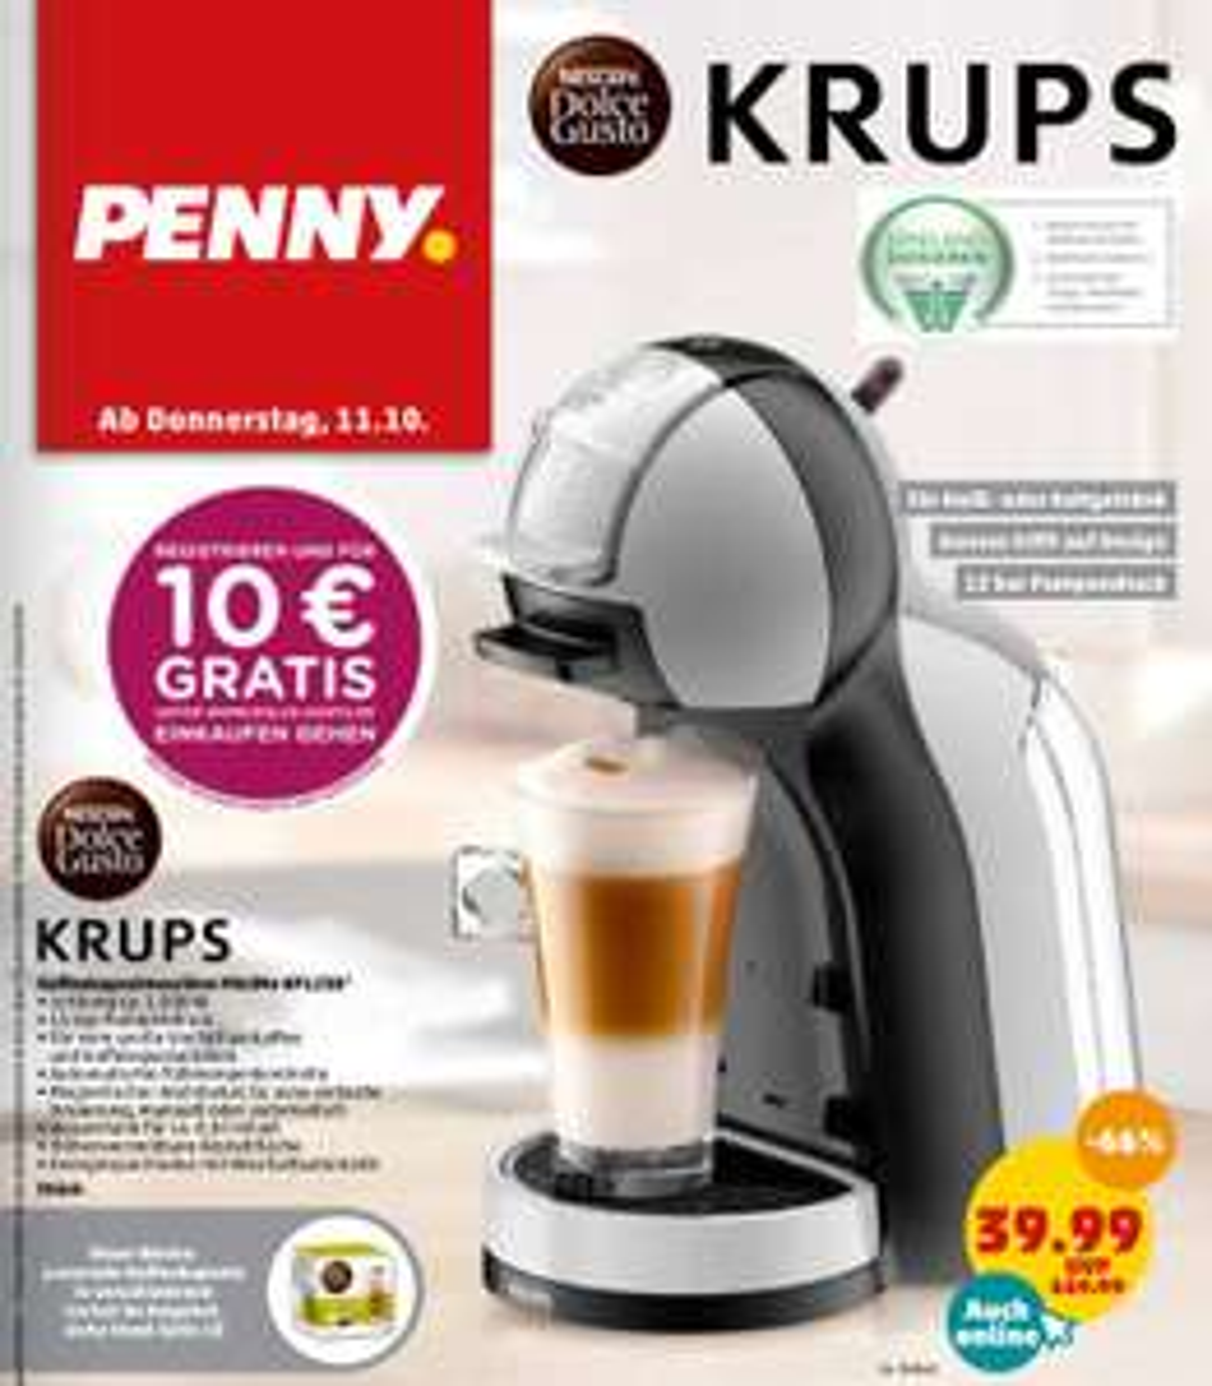 [Penny] Dolce Gusto Krups MiniMe KP123b für nur 39,99€